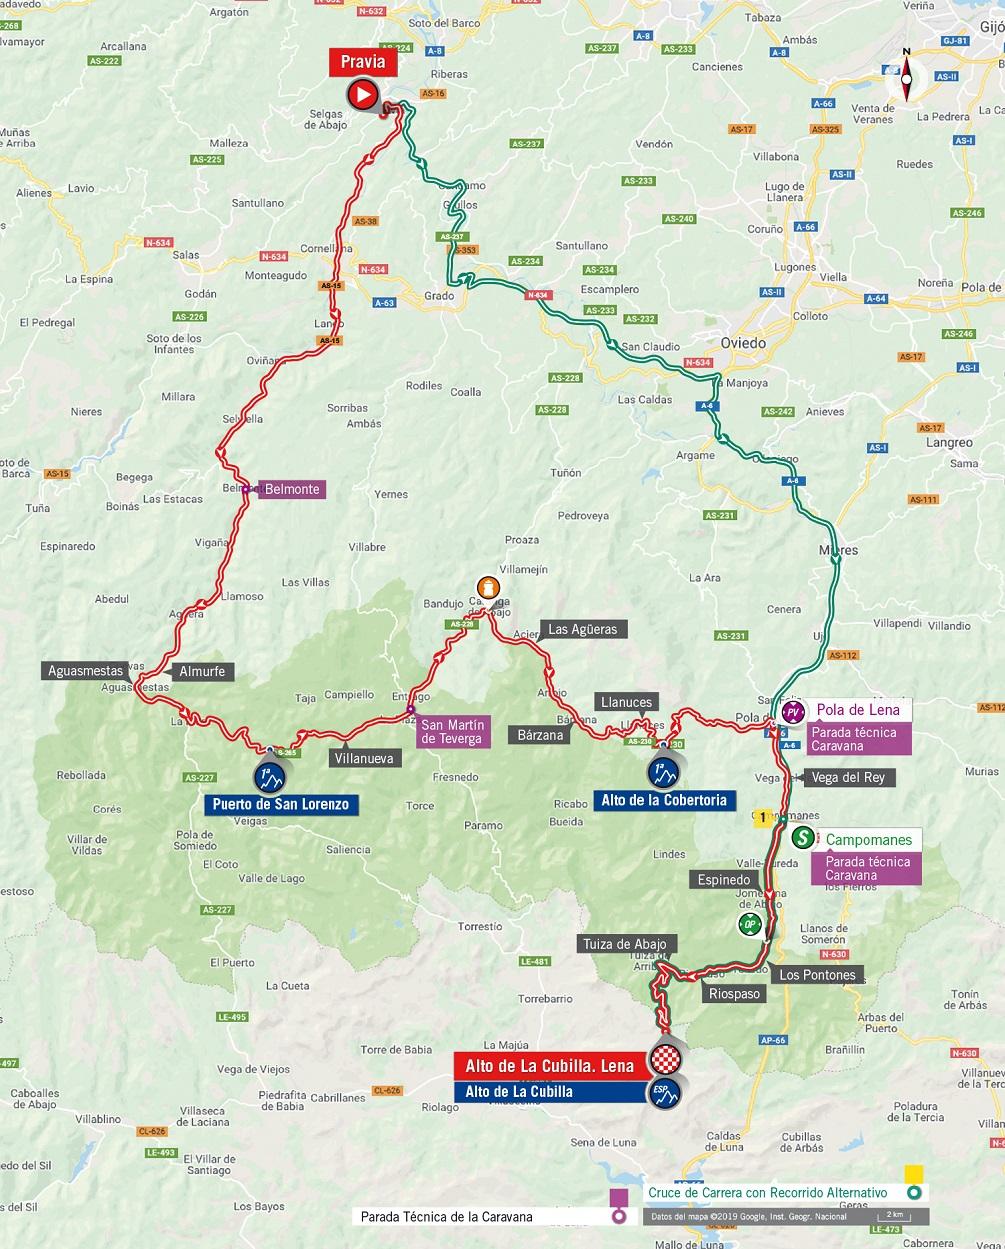 Streckenverlauf Vuelta a España 2019 - Etappe 16